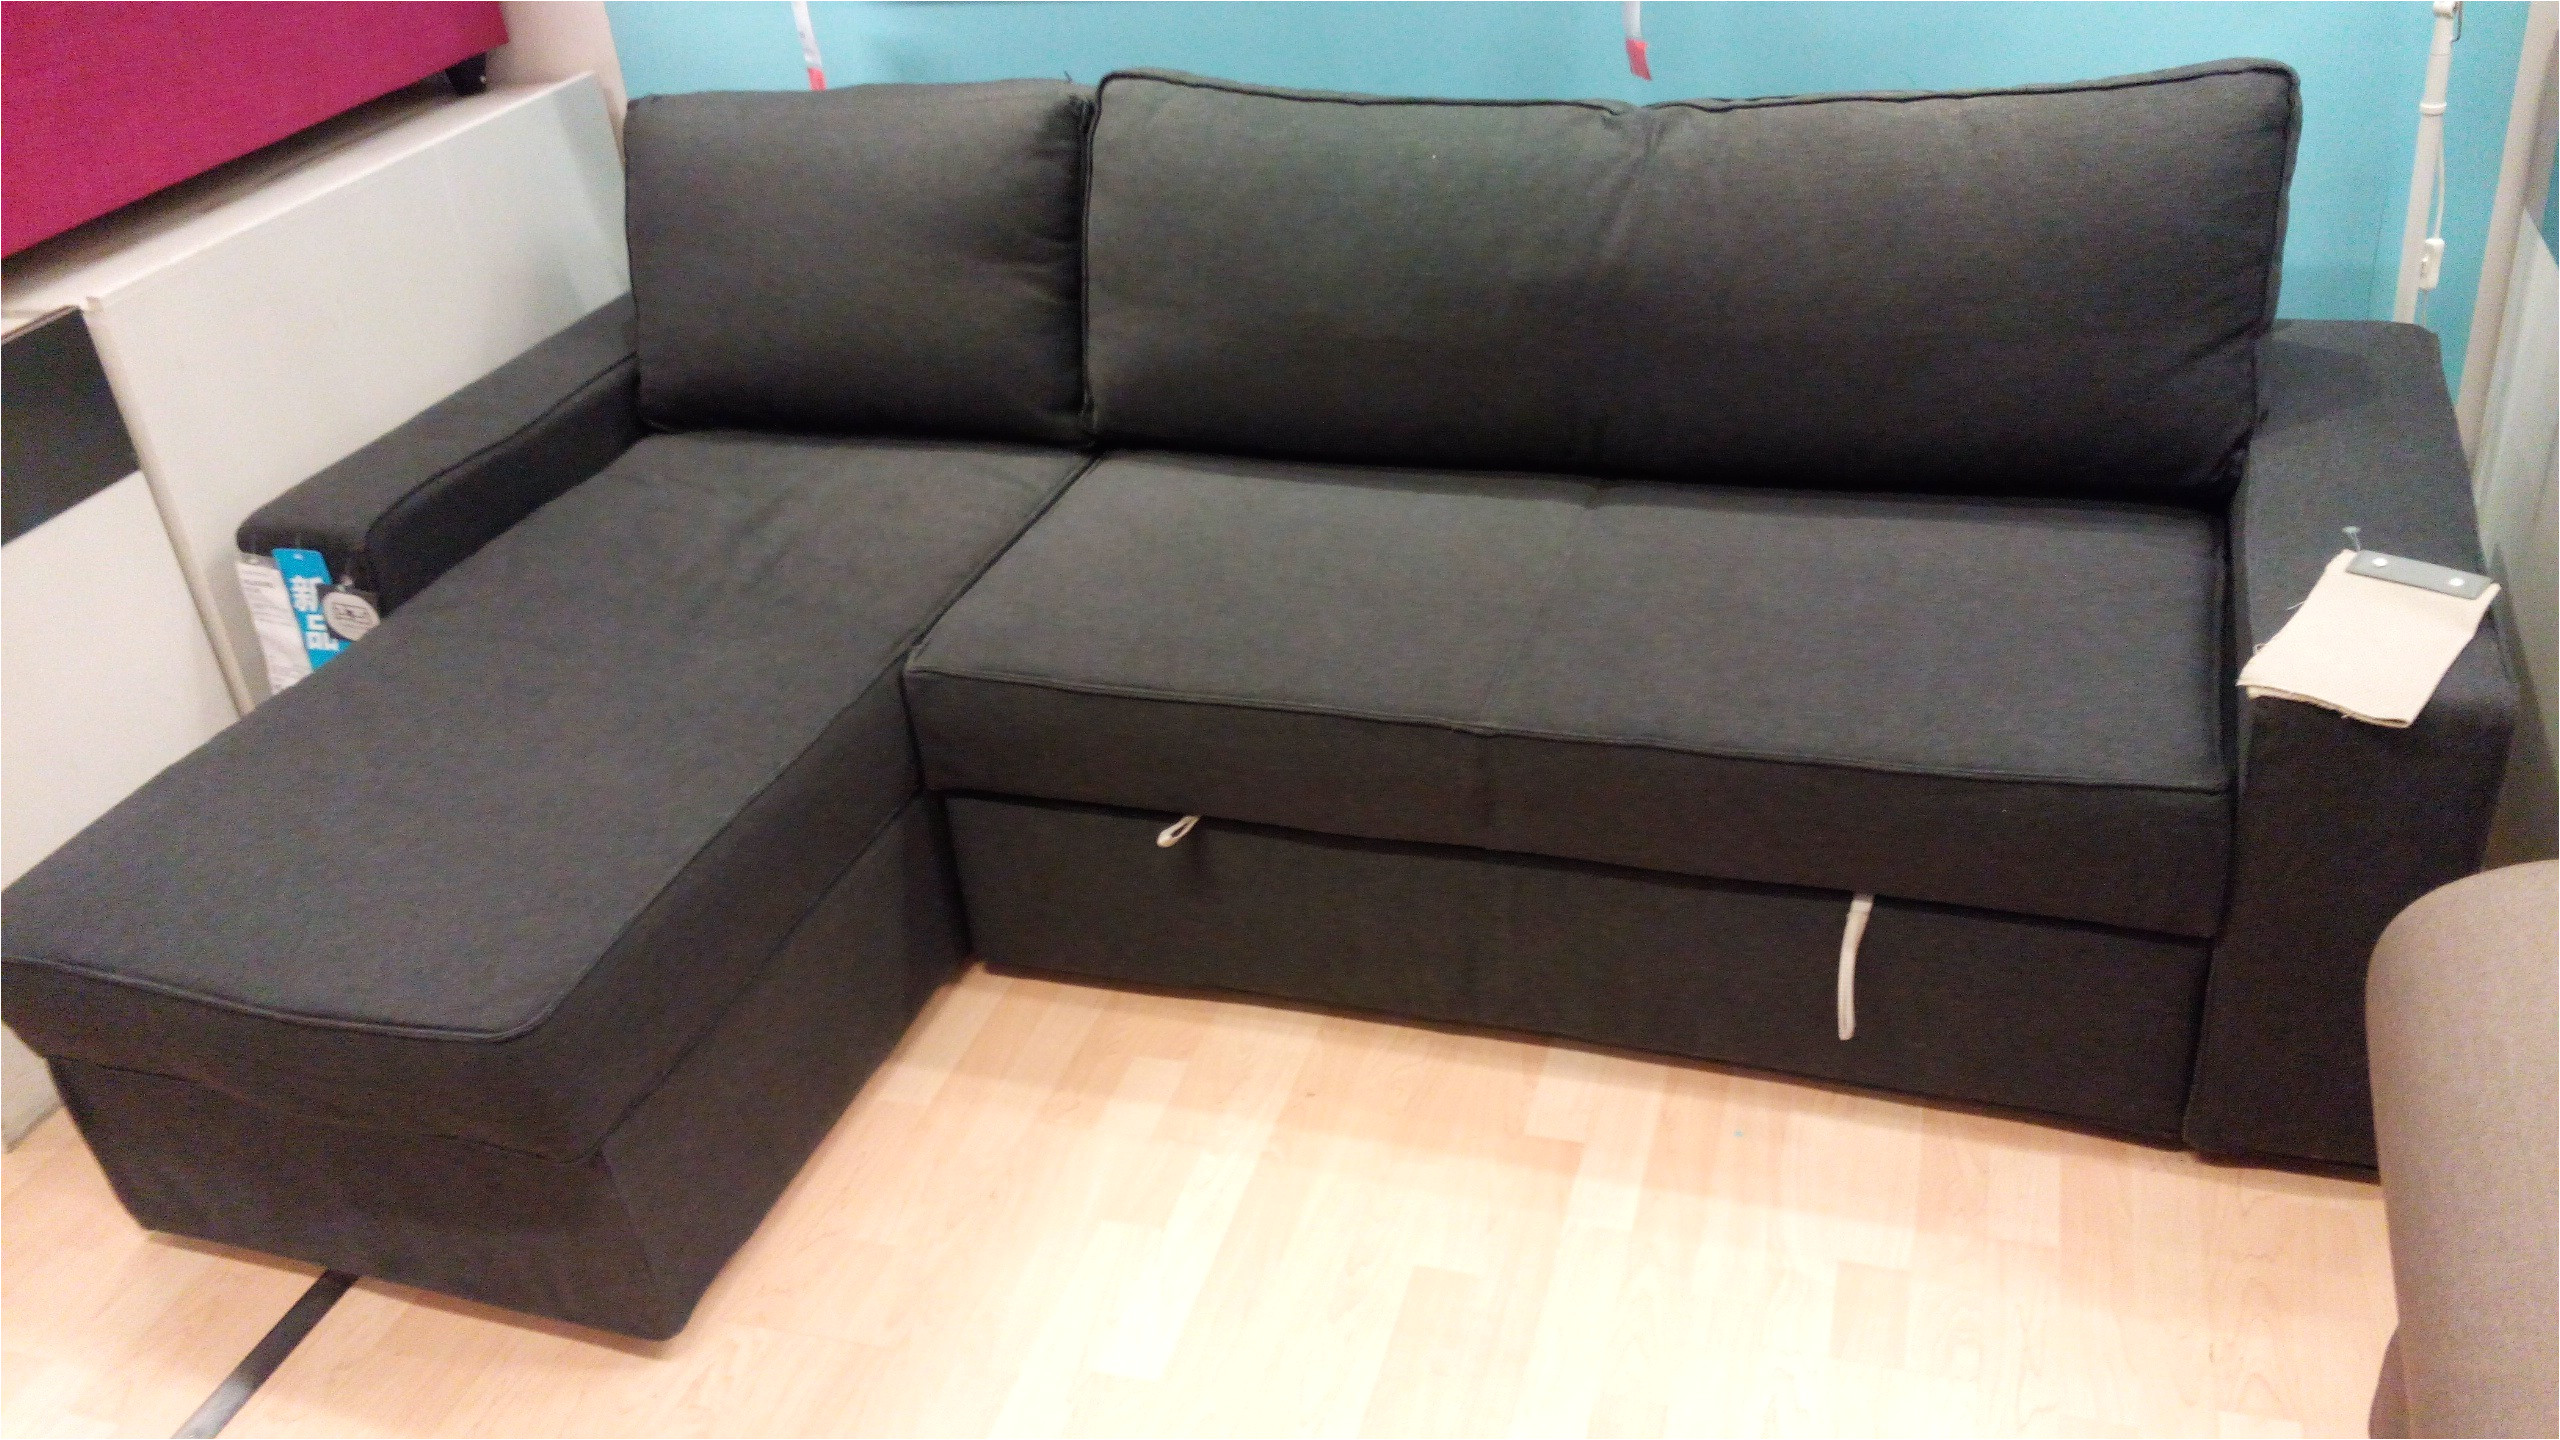 ikea schlafsofa friheten einzigartig awesome friheten sofa bed review designsolutions usa sammlung of ikea schlafsofa friheten